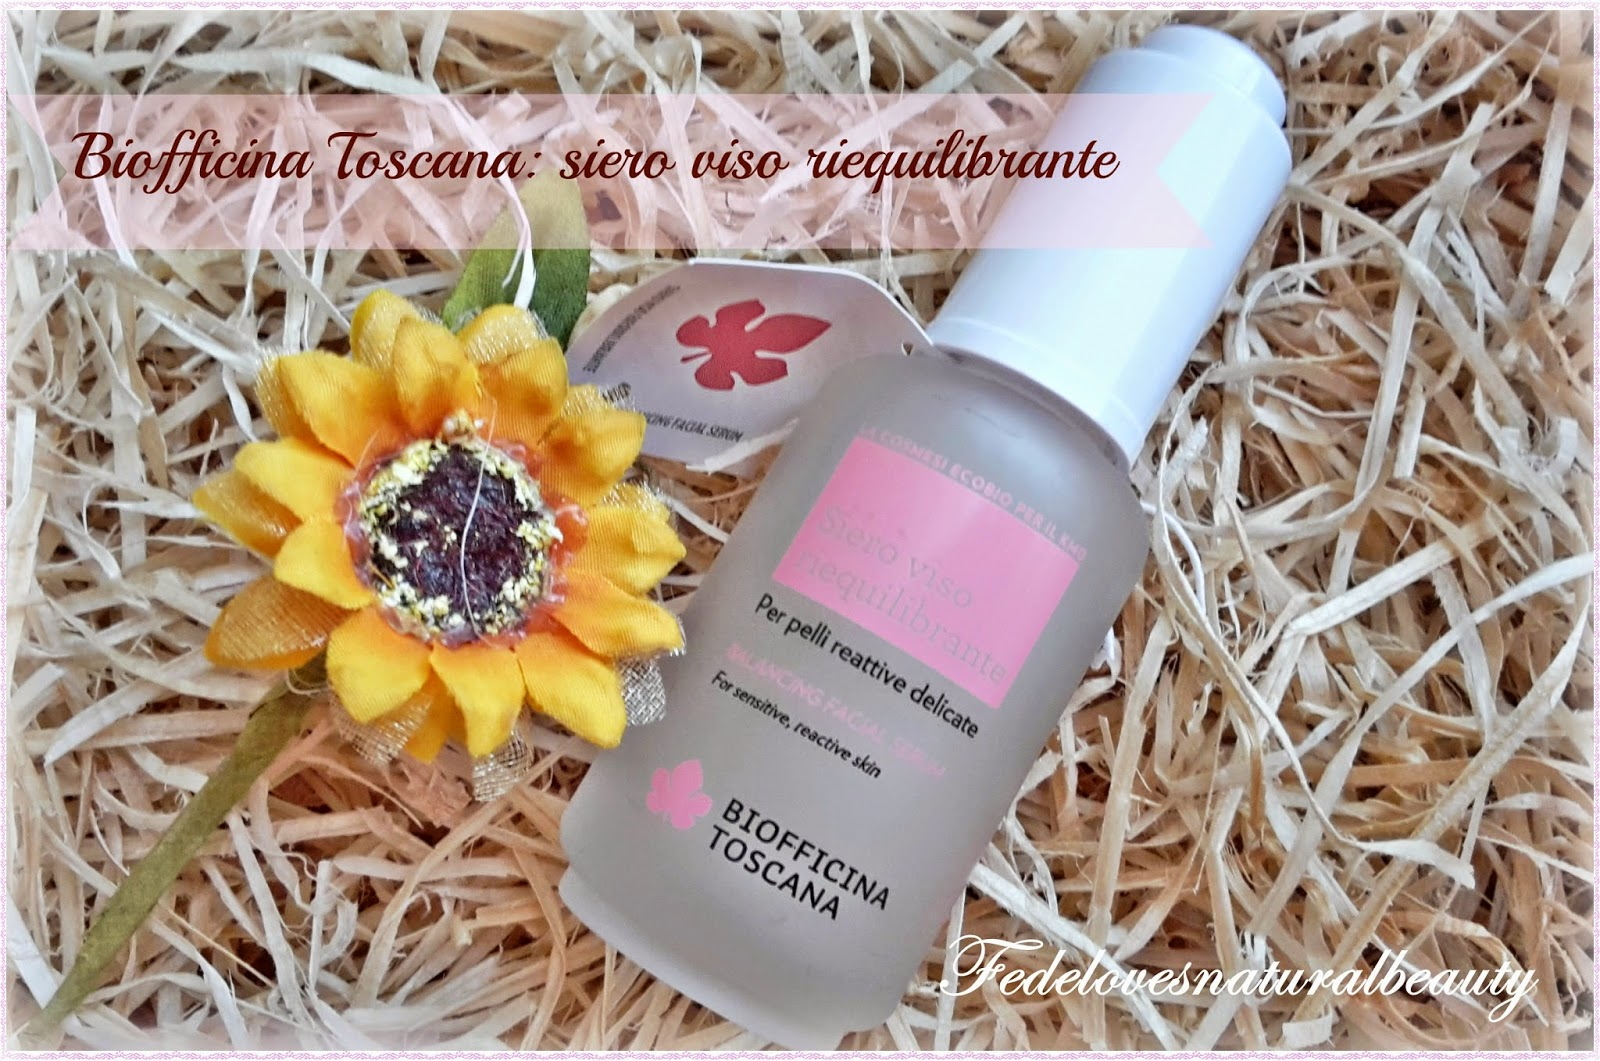 Biofficina Toscana: siero viso riequilibrante